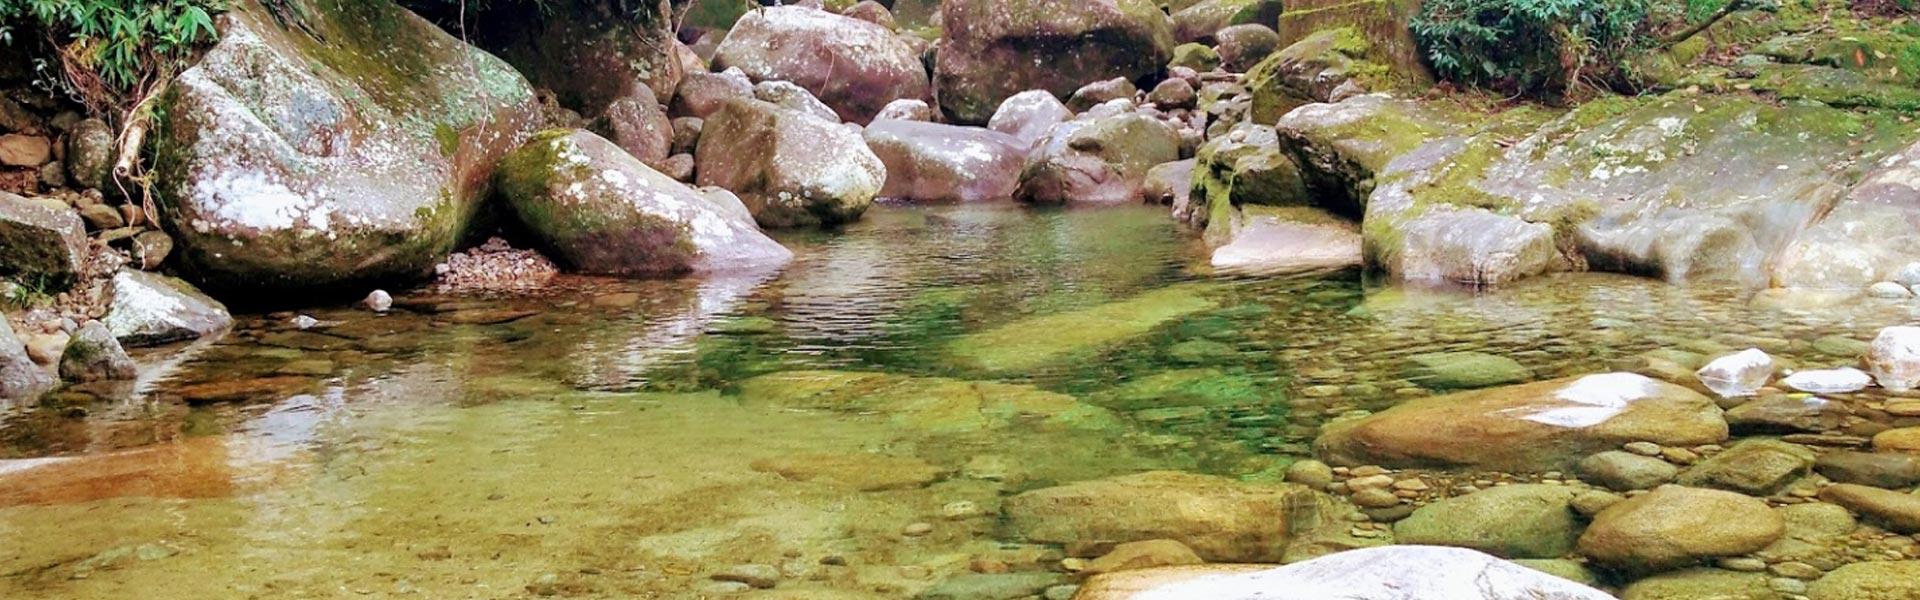 parque-nacional-da-serra-dos-orgaos-03